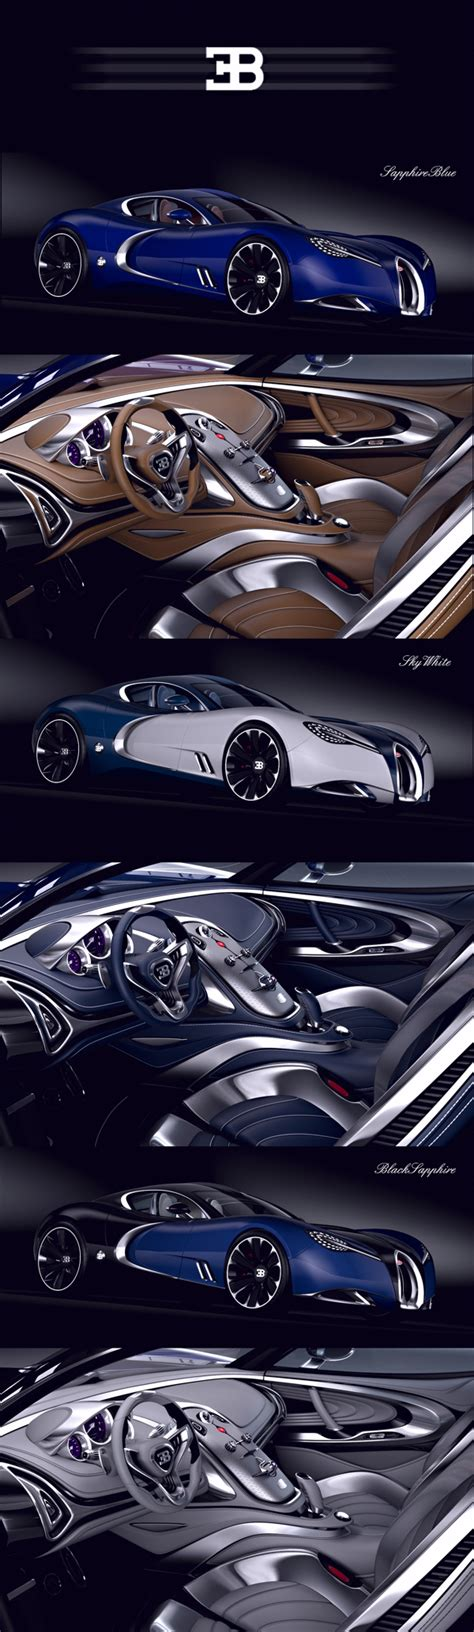 bugatti concept gangloff bugatti gangloff concept love cars motorcycles